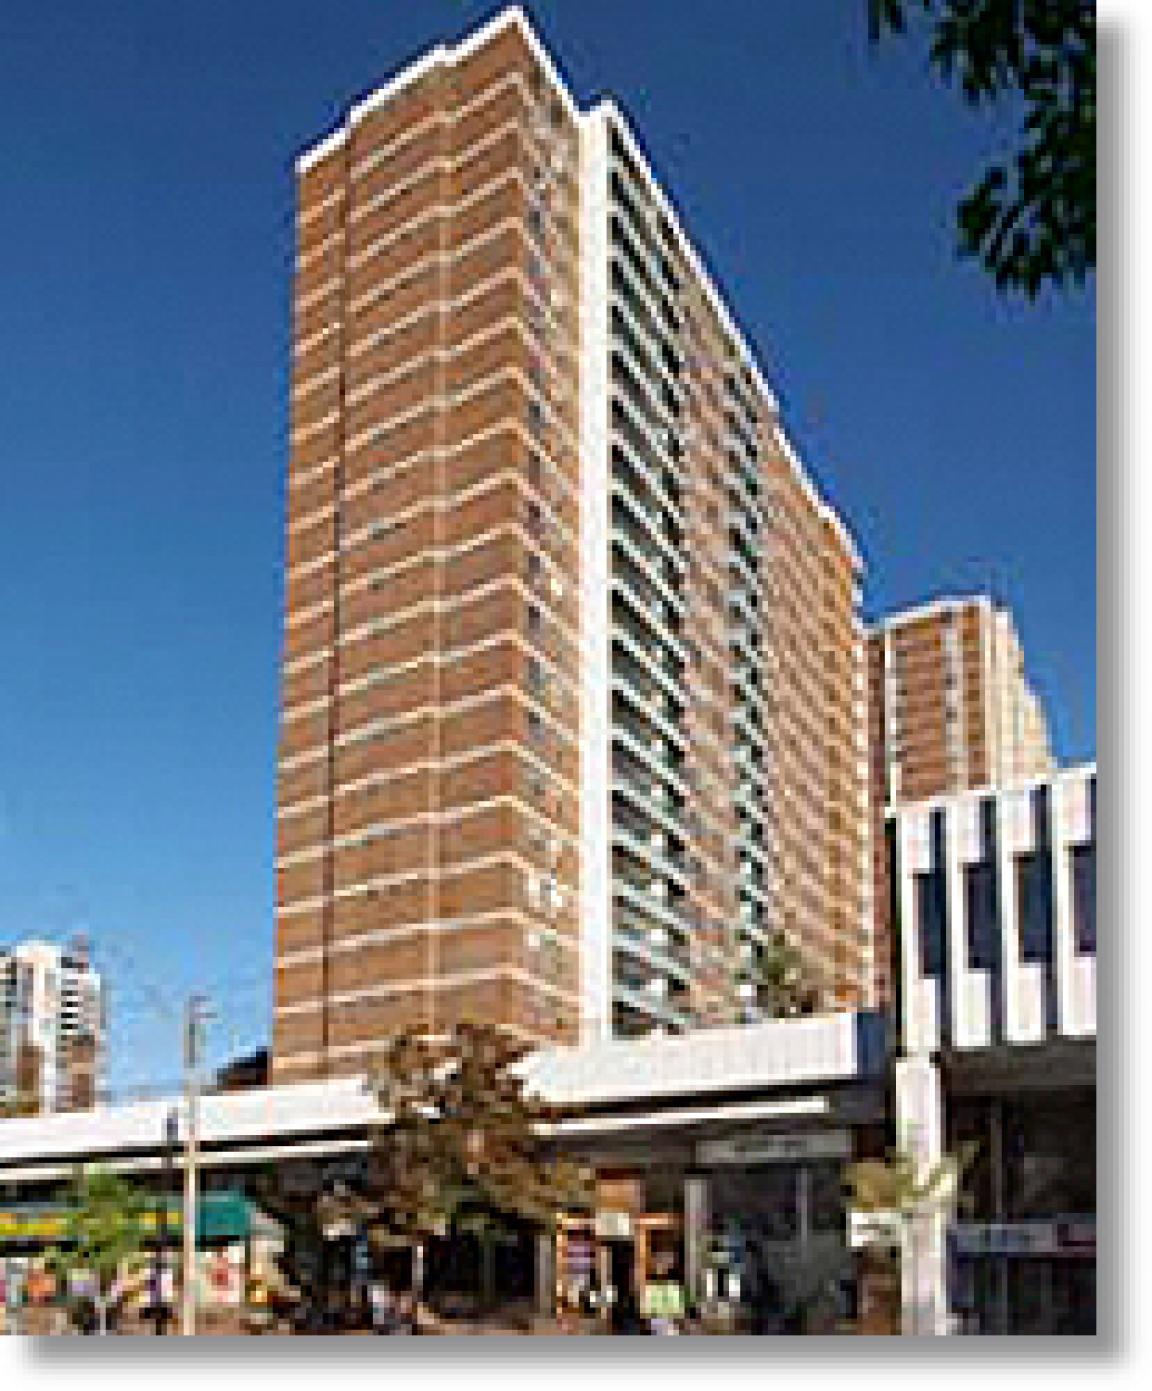 Apartment Building For Rent: 140 Carlton Street, Toronto, Ontario M5A-3W7